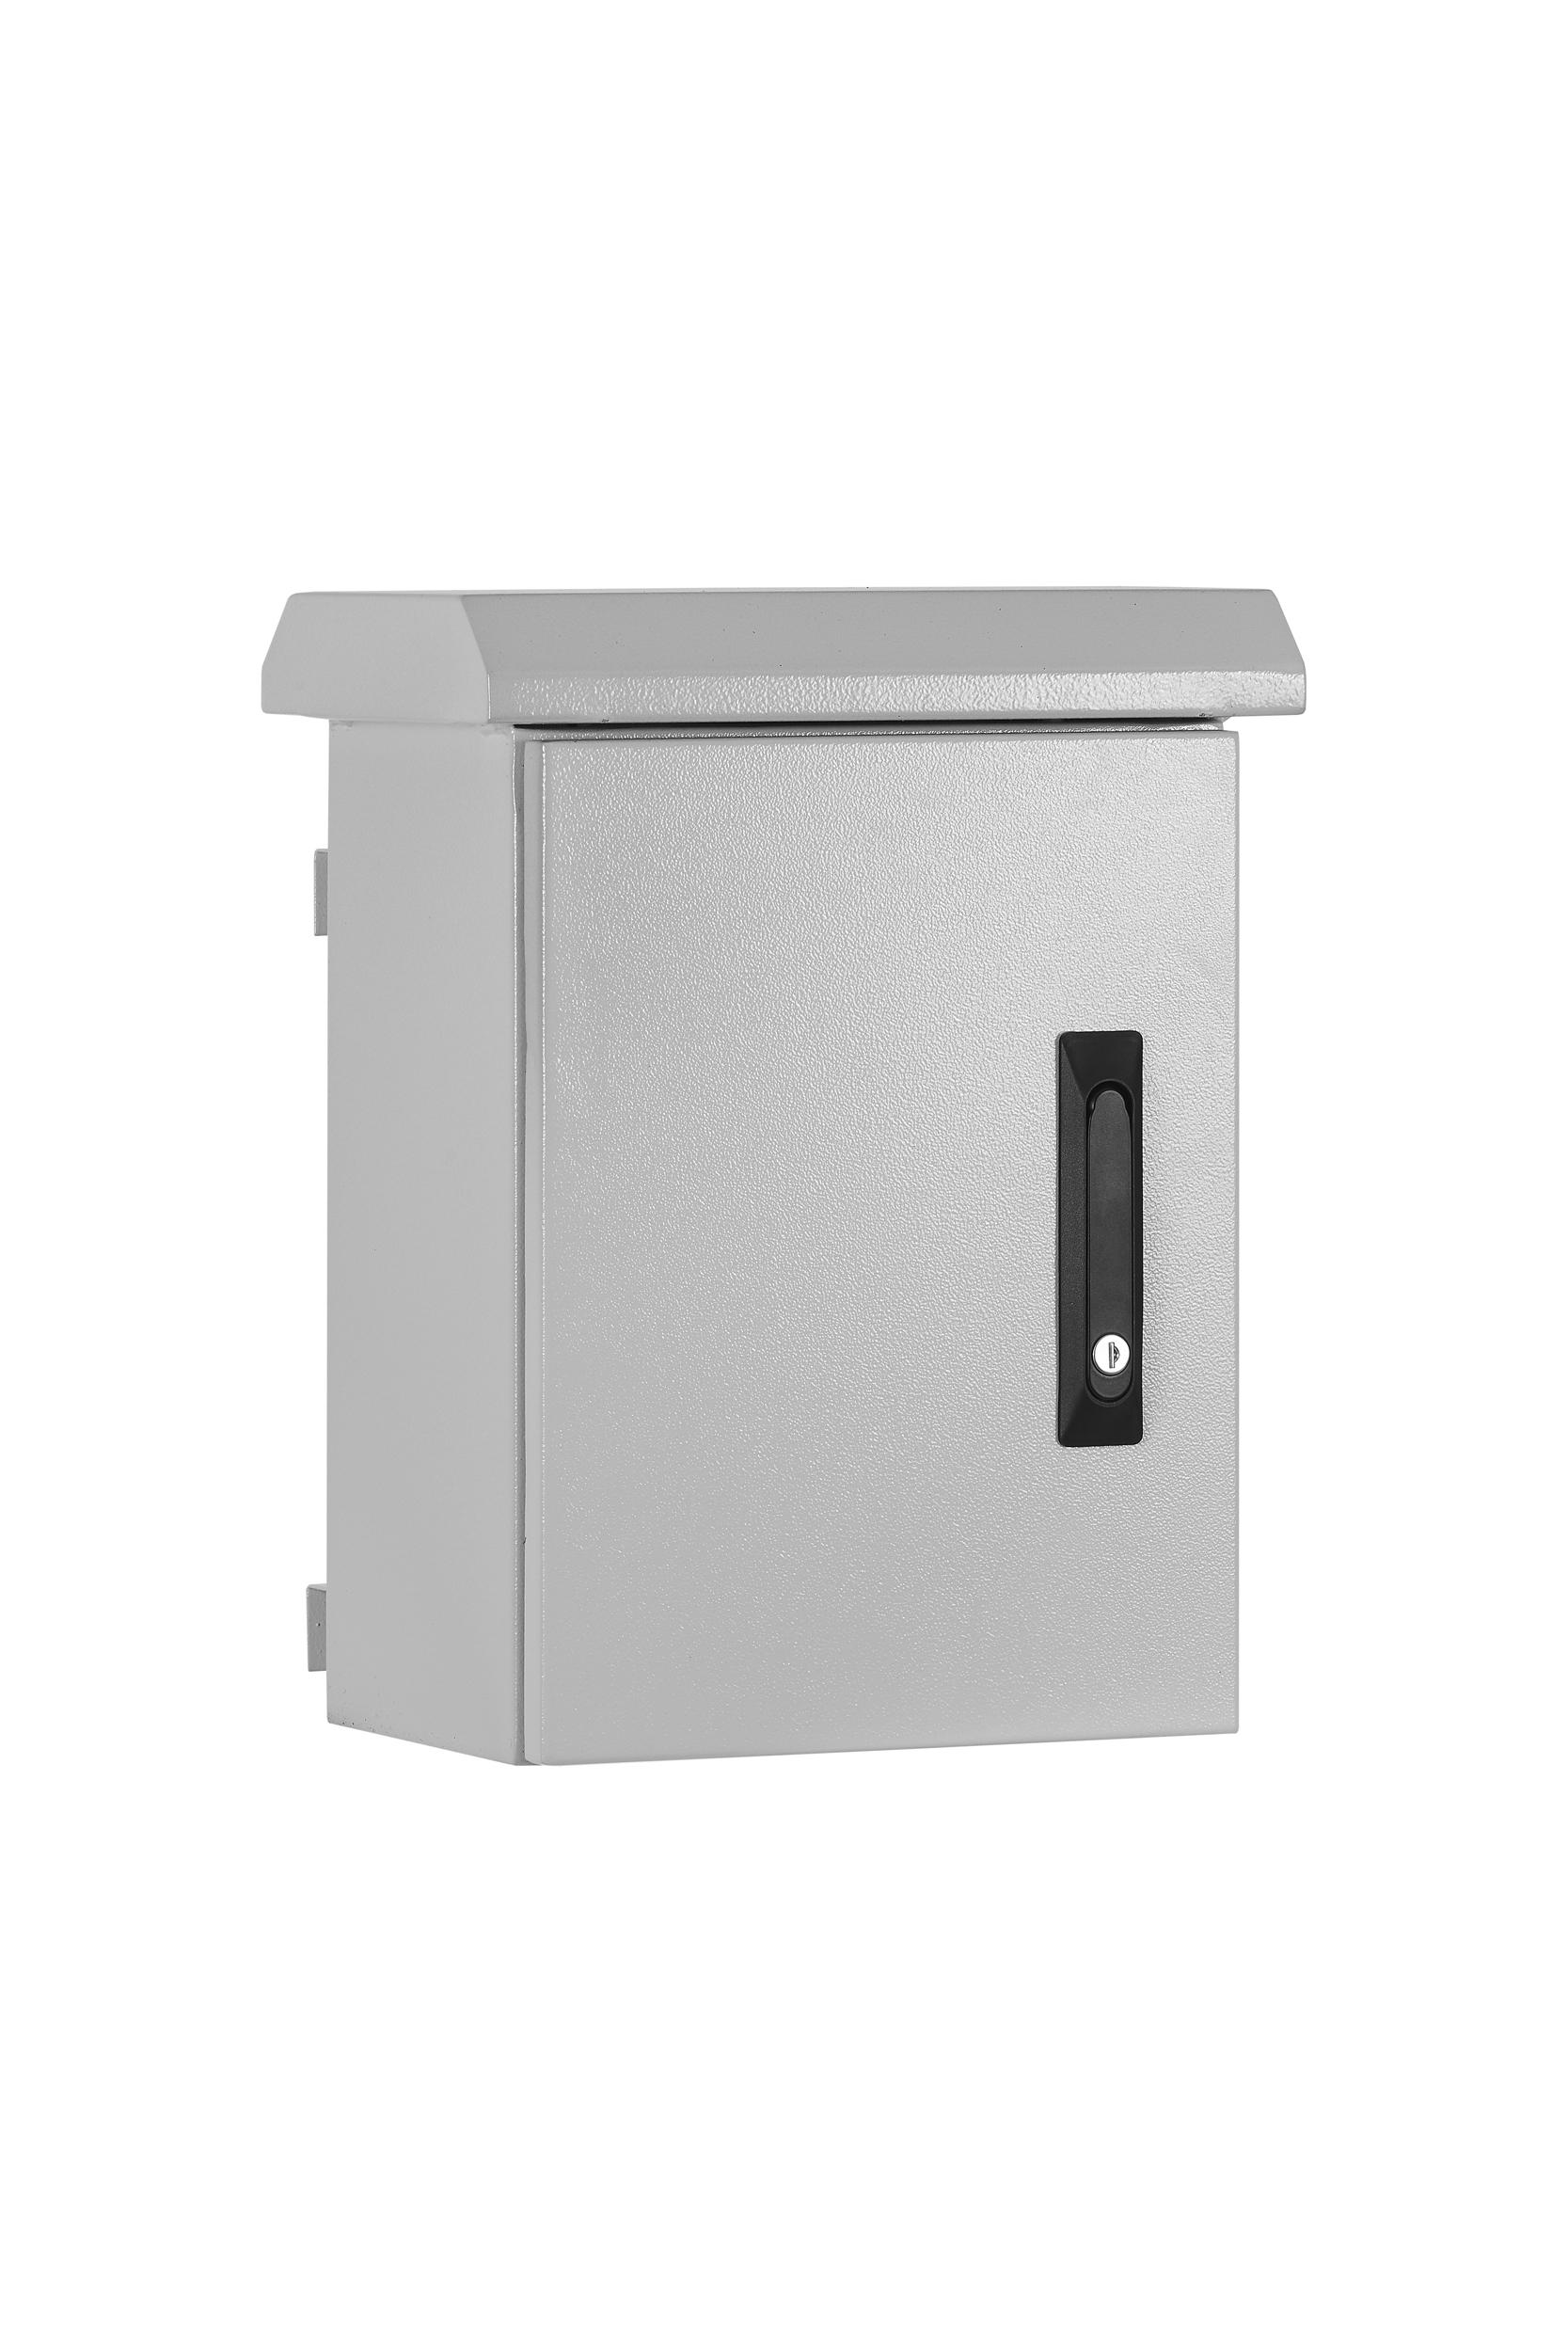 ZE-OBX304020-T00-CC ZE-OBX304020-T00-CC OUTBOX Mini